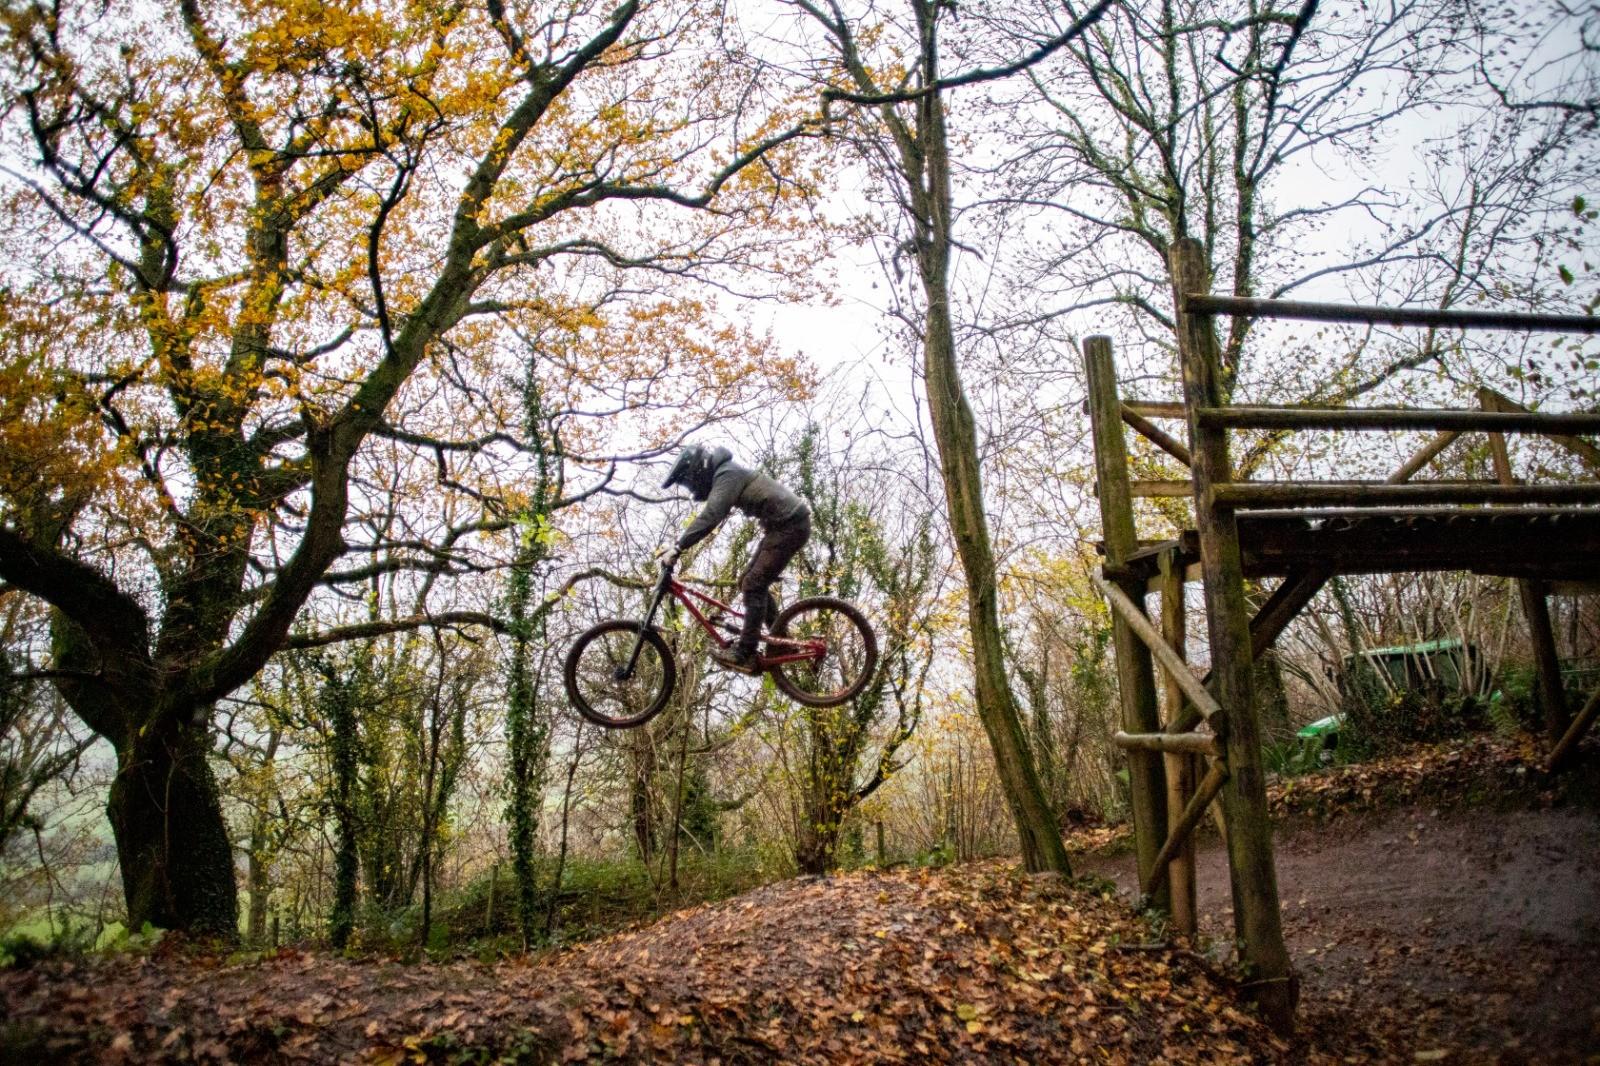 D8EE2591-5225-480D-A714-A2CB45F2FBBA - martin dunn - Mountain Biking Pictures - Vital MTB